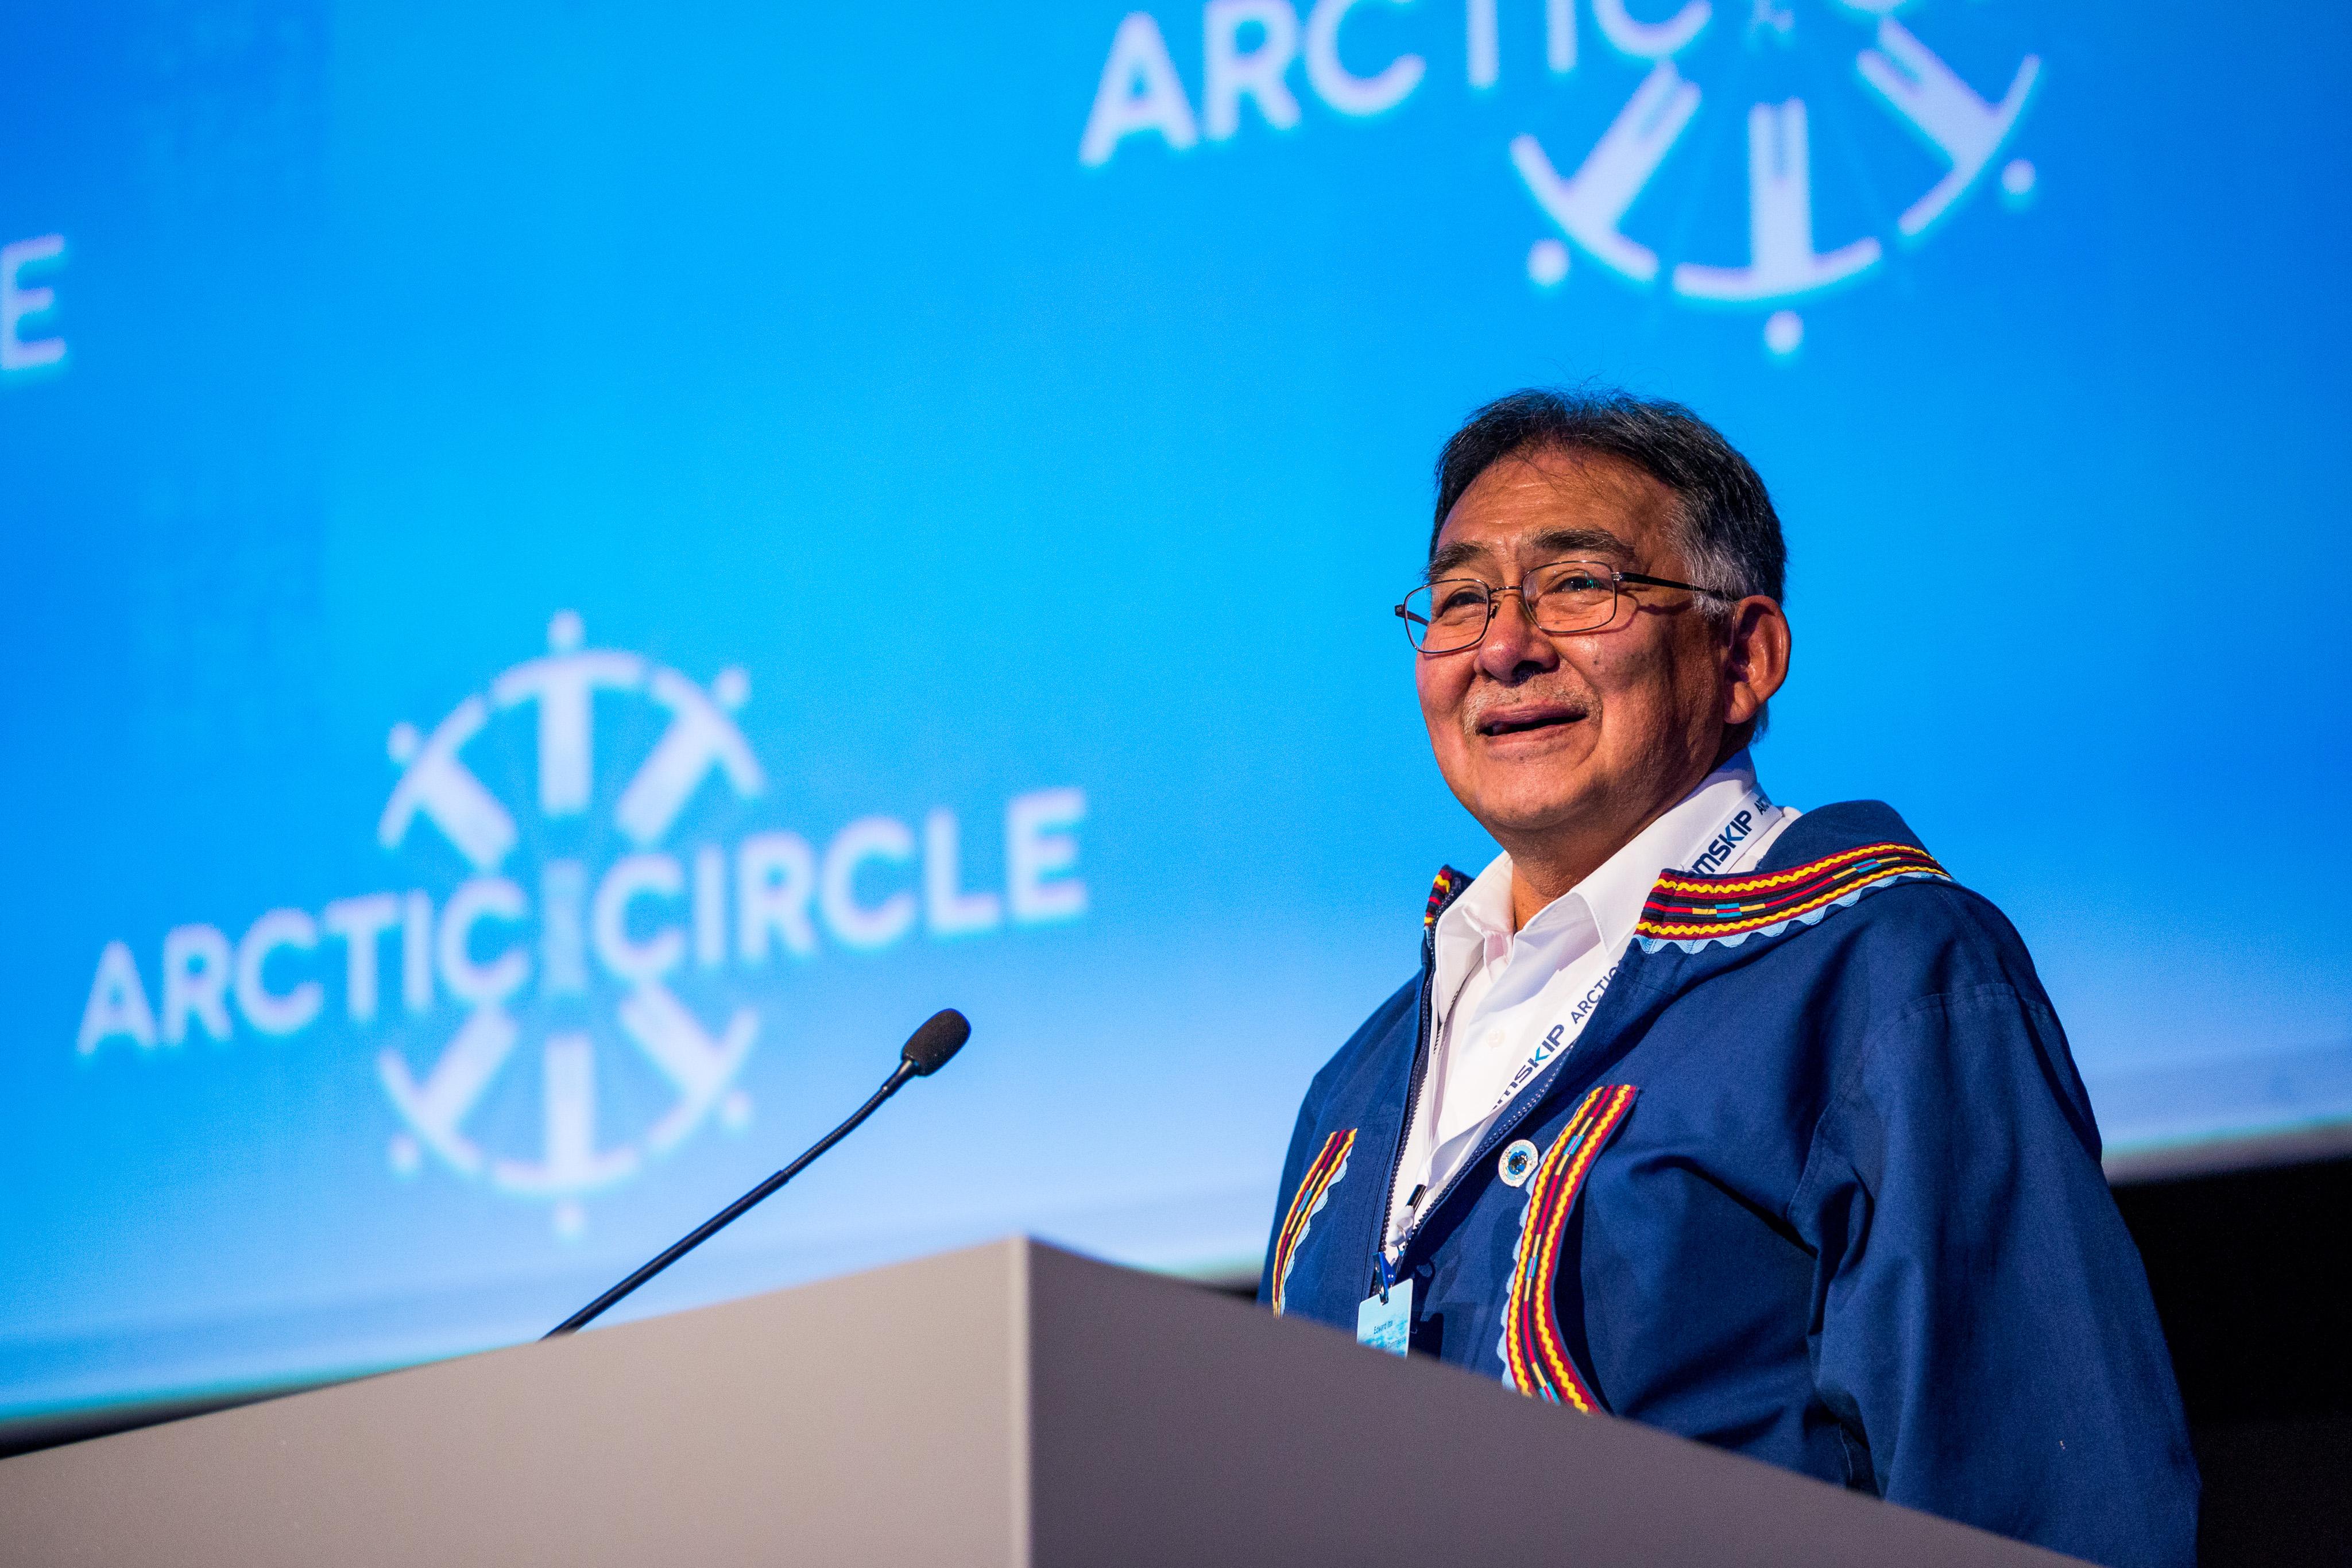 Edward Itta, Commissioner, U.S. Arctic Research Commission (Loren Holmes / Alaska Dispatch News)